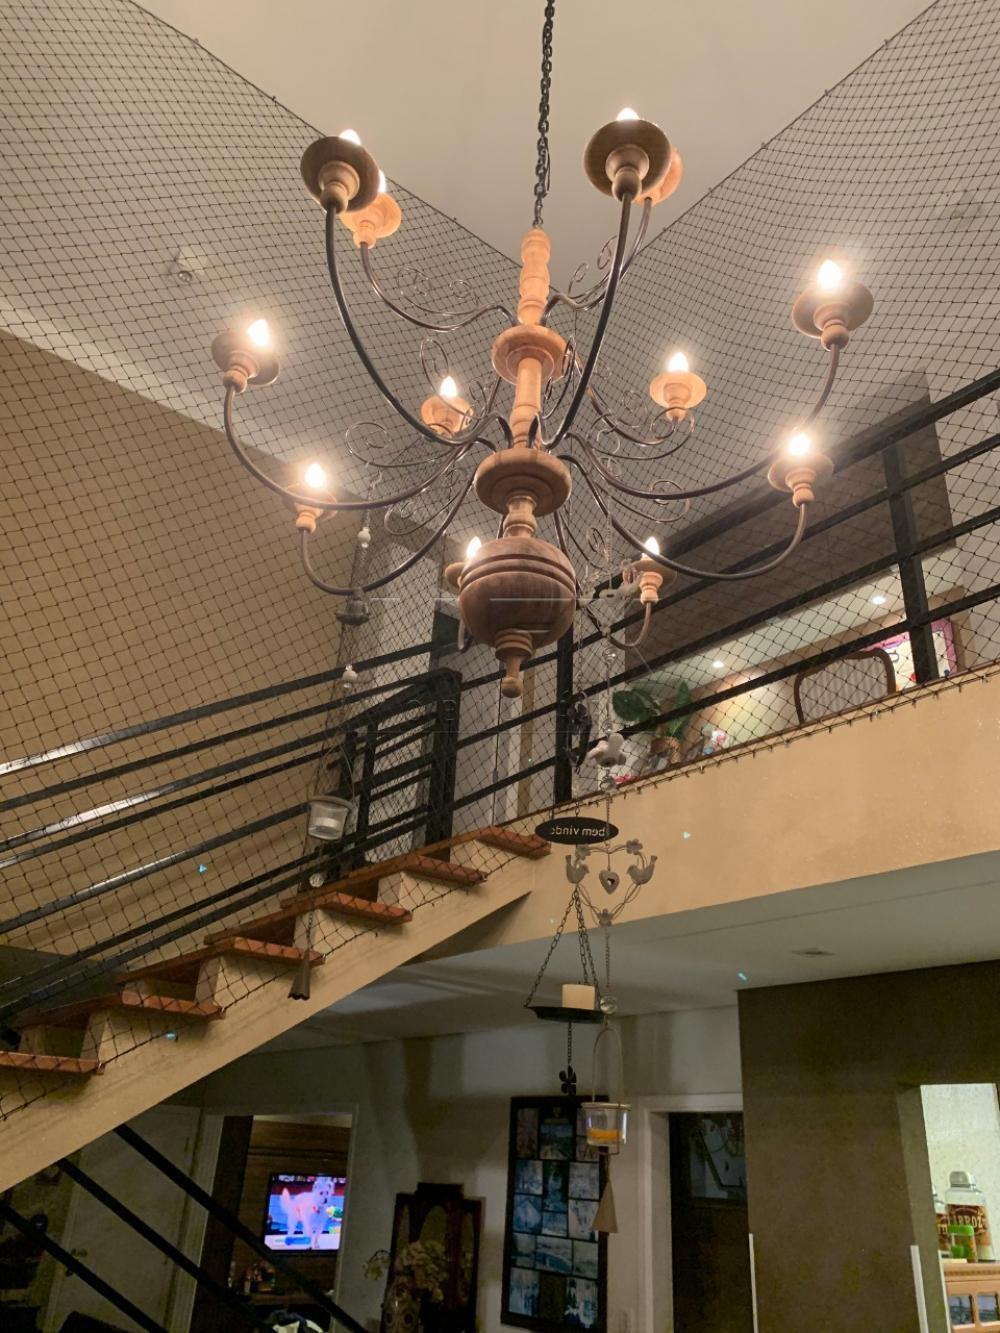 Comprar Casa / Condomínio em Bauru apenas R$ 1.500.000,00 - Foto 8